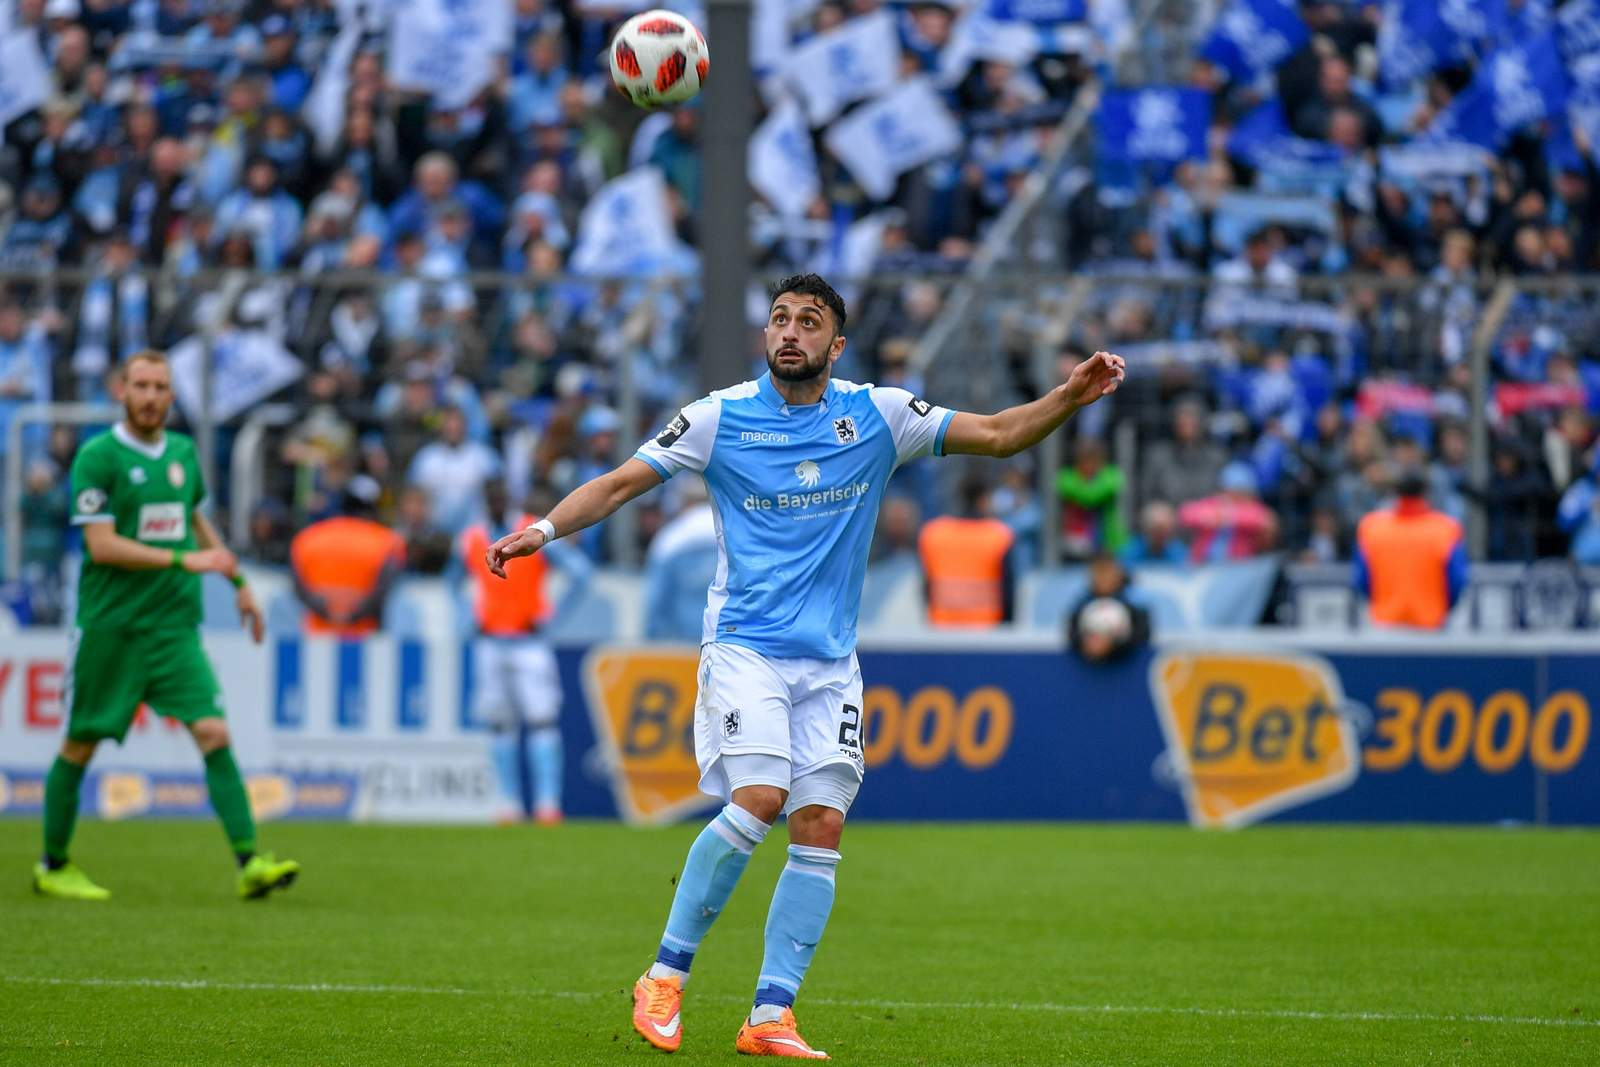 Efkan Bekiroglu (r.) im Spiel gegen Fortuna Köln.